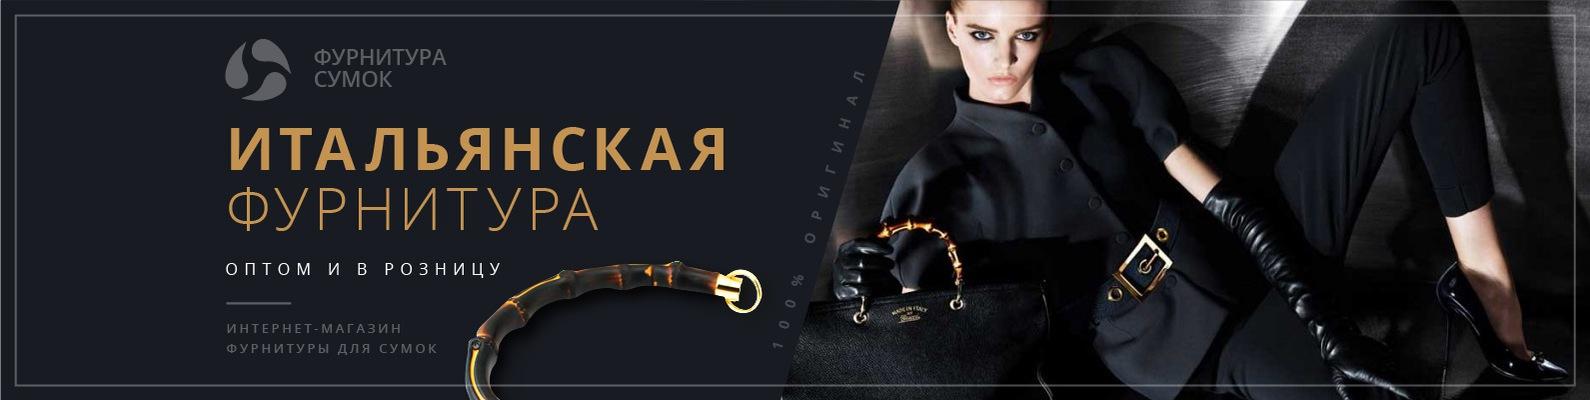 609a14f99d2e Швейная фурнитура из Италии | ВКонтакте